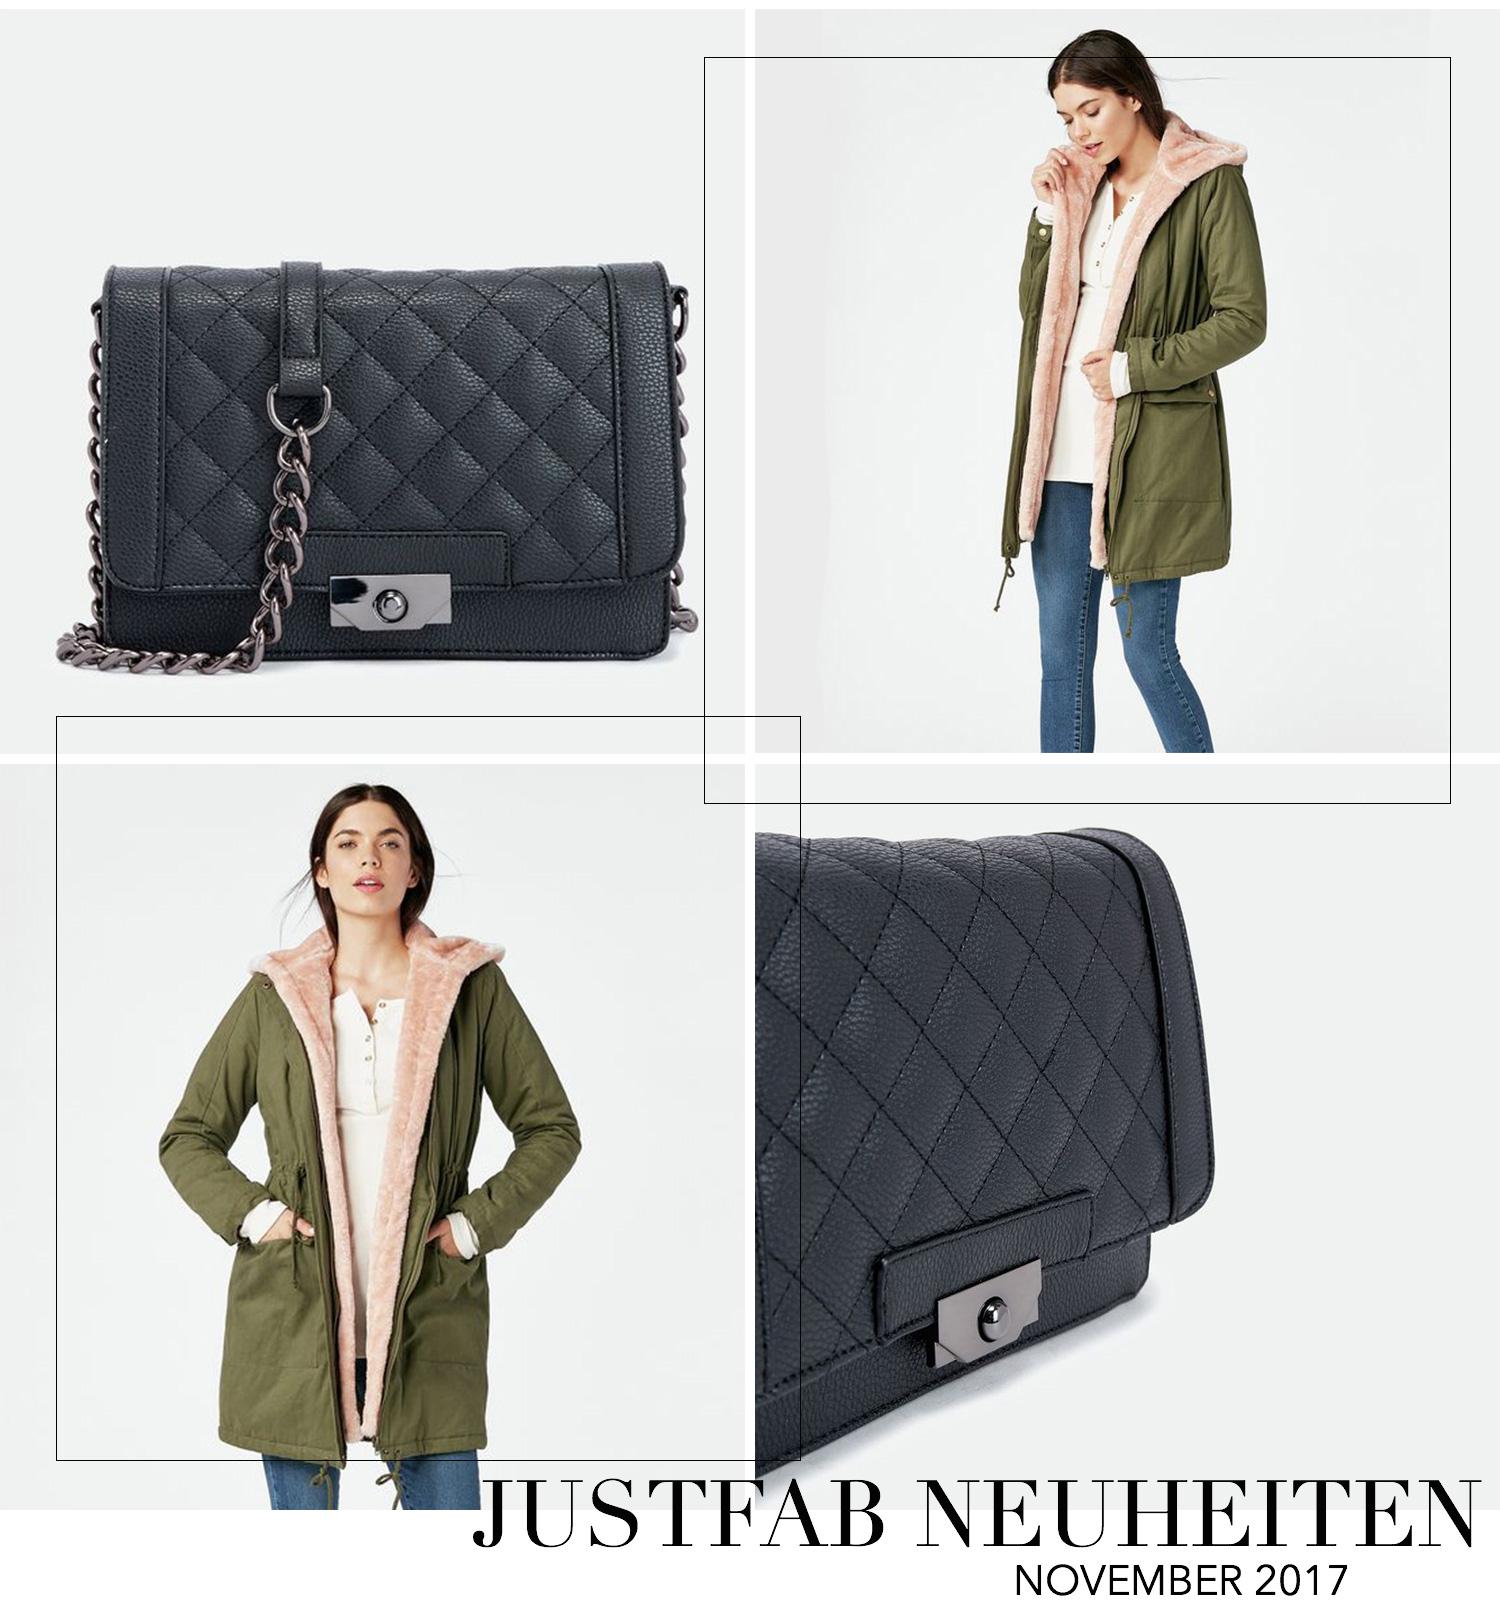 November Favoriten 2017, Monatsrückblick, JustFab Neuheiten, Talon Handtasche, Khaki Parka mit rosa Fell, bezauberndenana.de